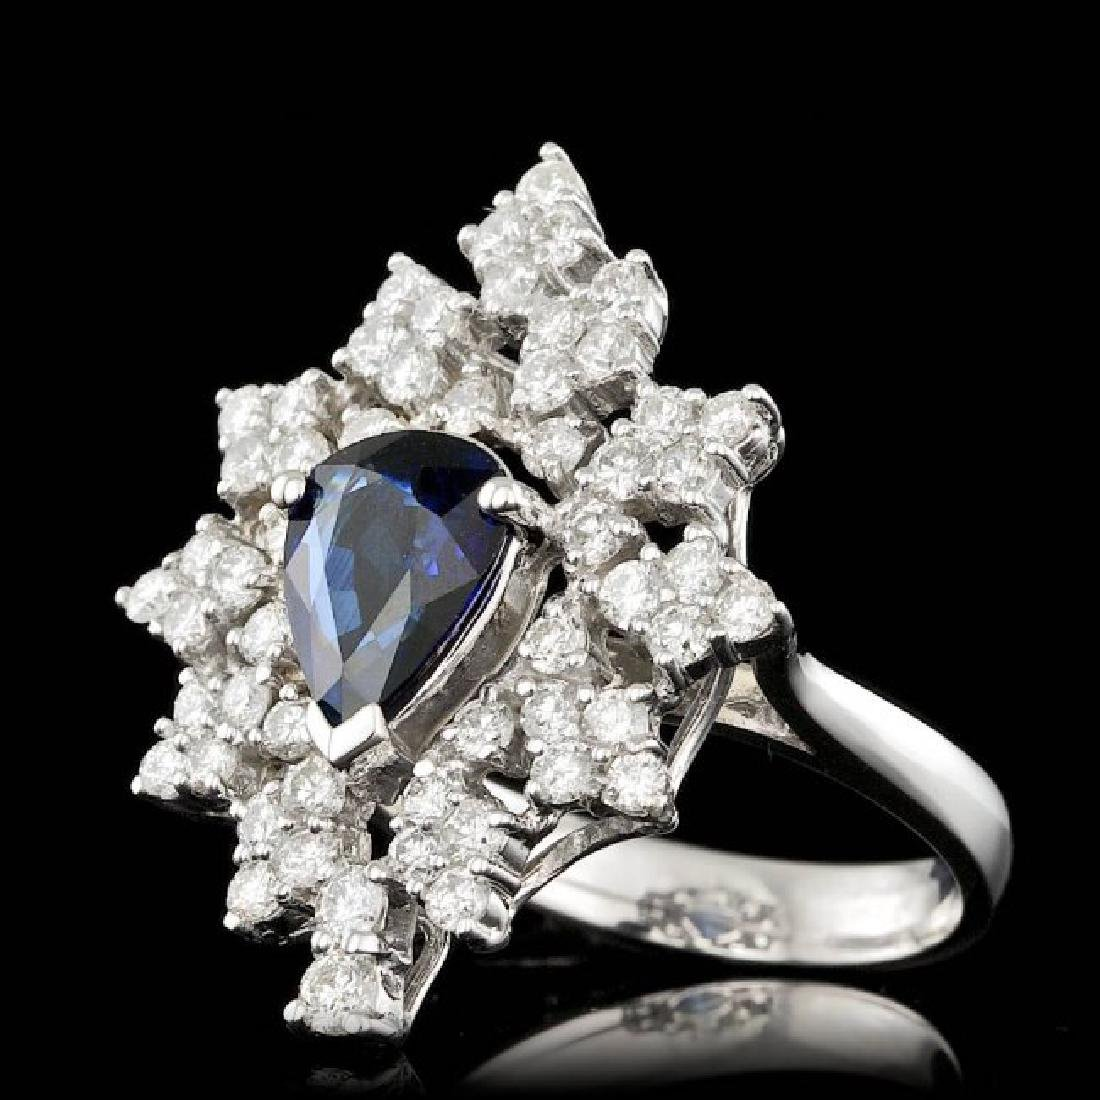 14k Gold 2.00ct Sapphire 1.55ct Diamond Ring - 2